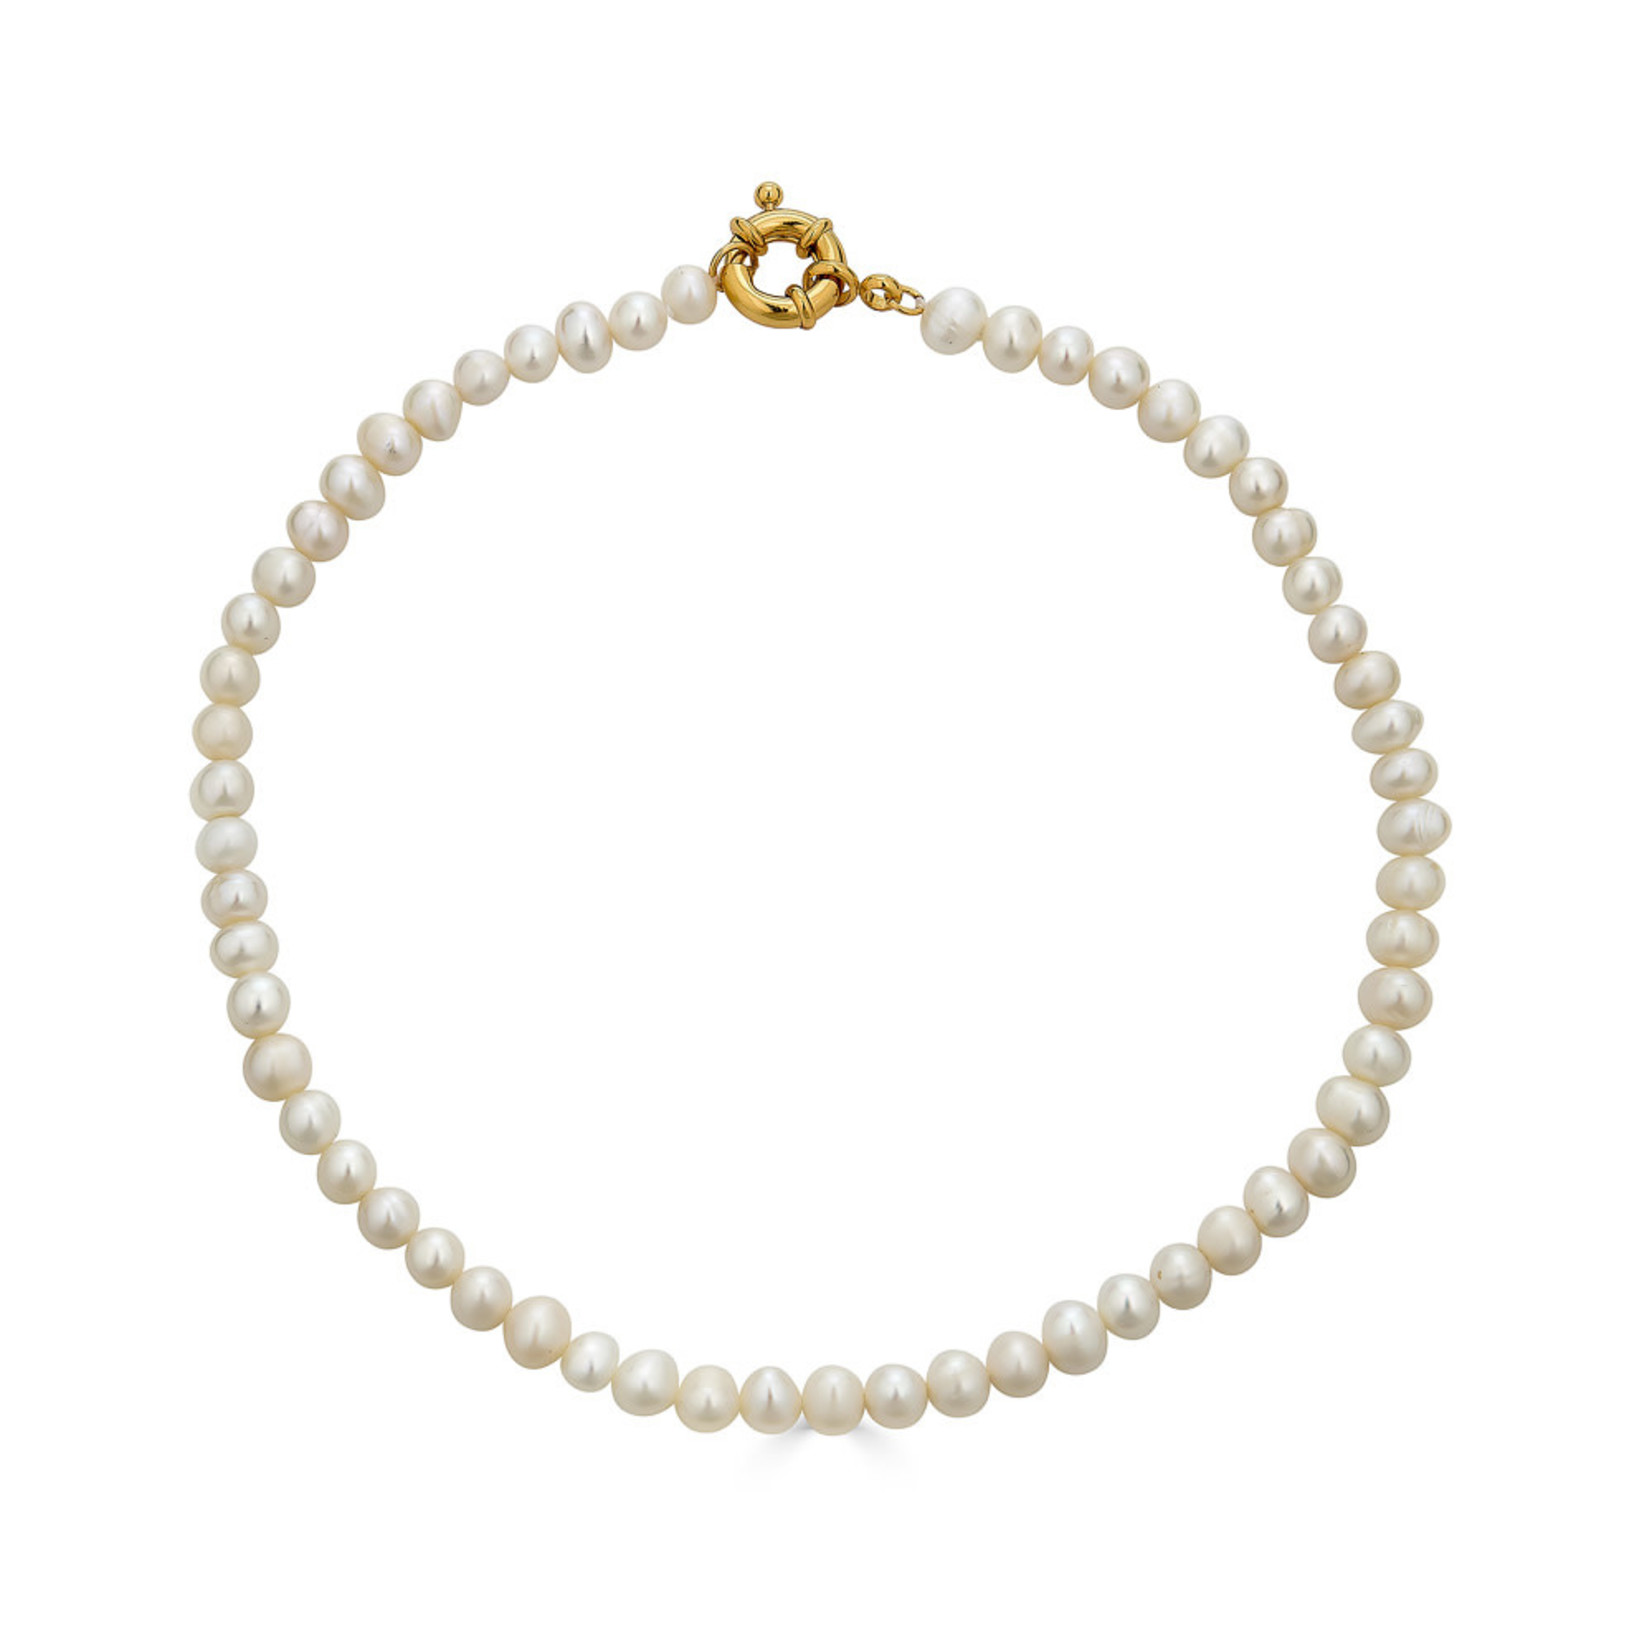 Rendor Oyster Necklace